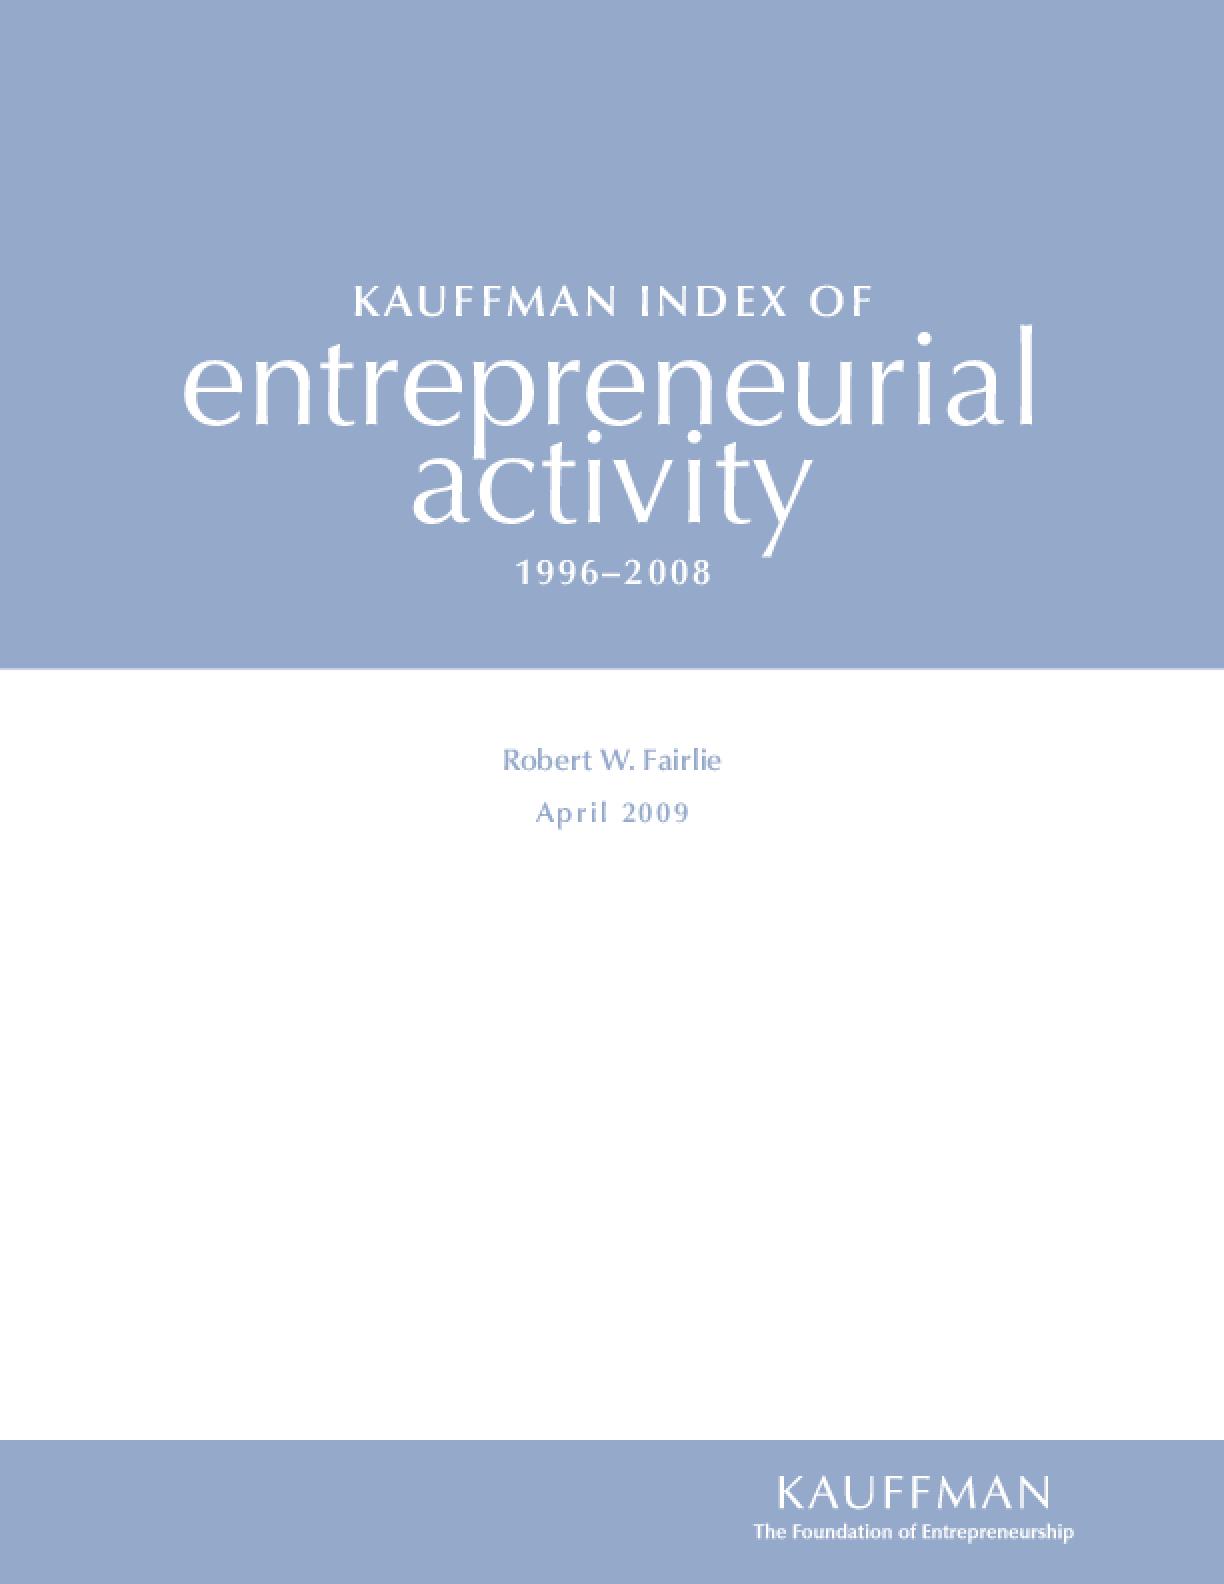 Kauffman Index of Entrepreneurial Activity, 1996-2008